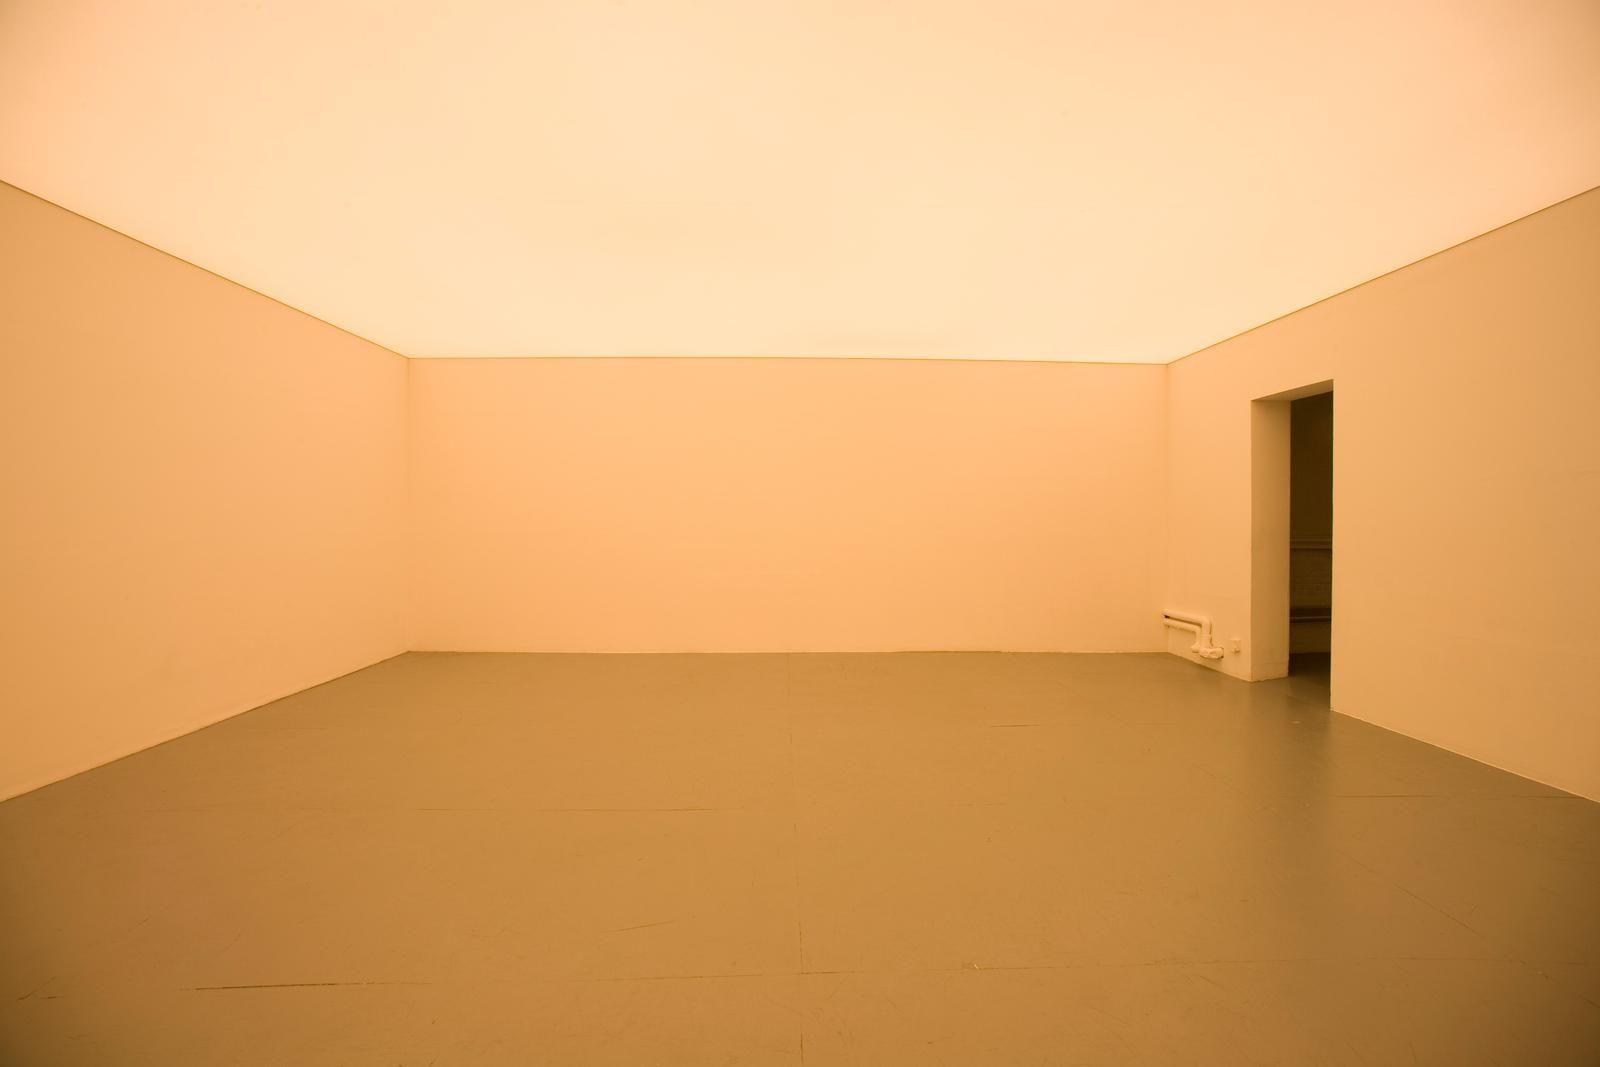 The natural light setup • Artwork • Studio Olafur Eliasson | ART ...